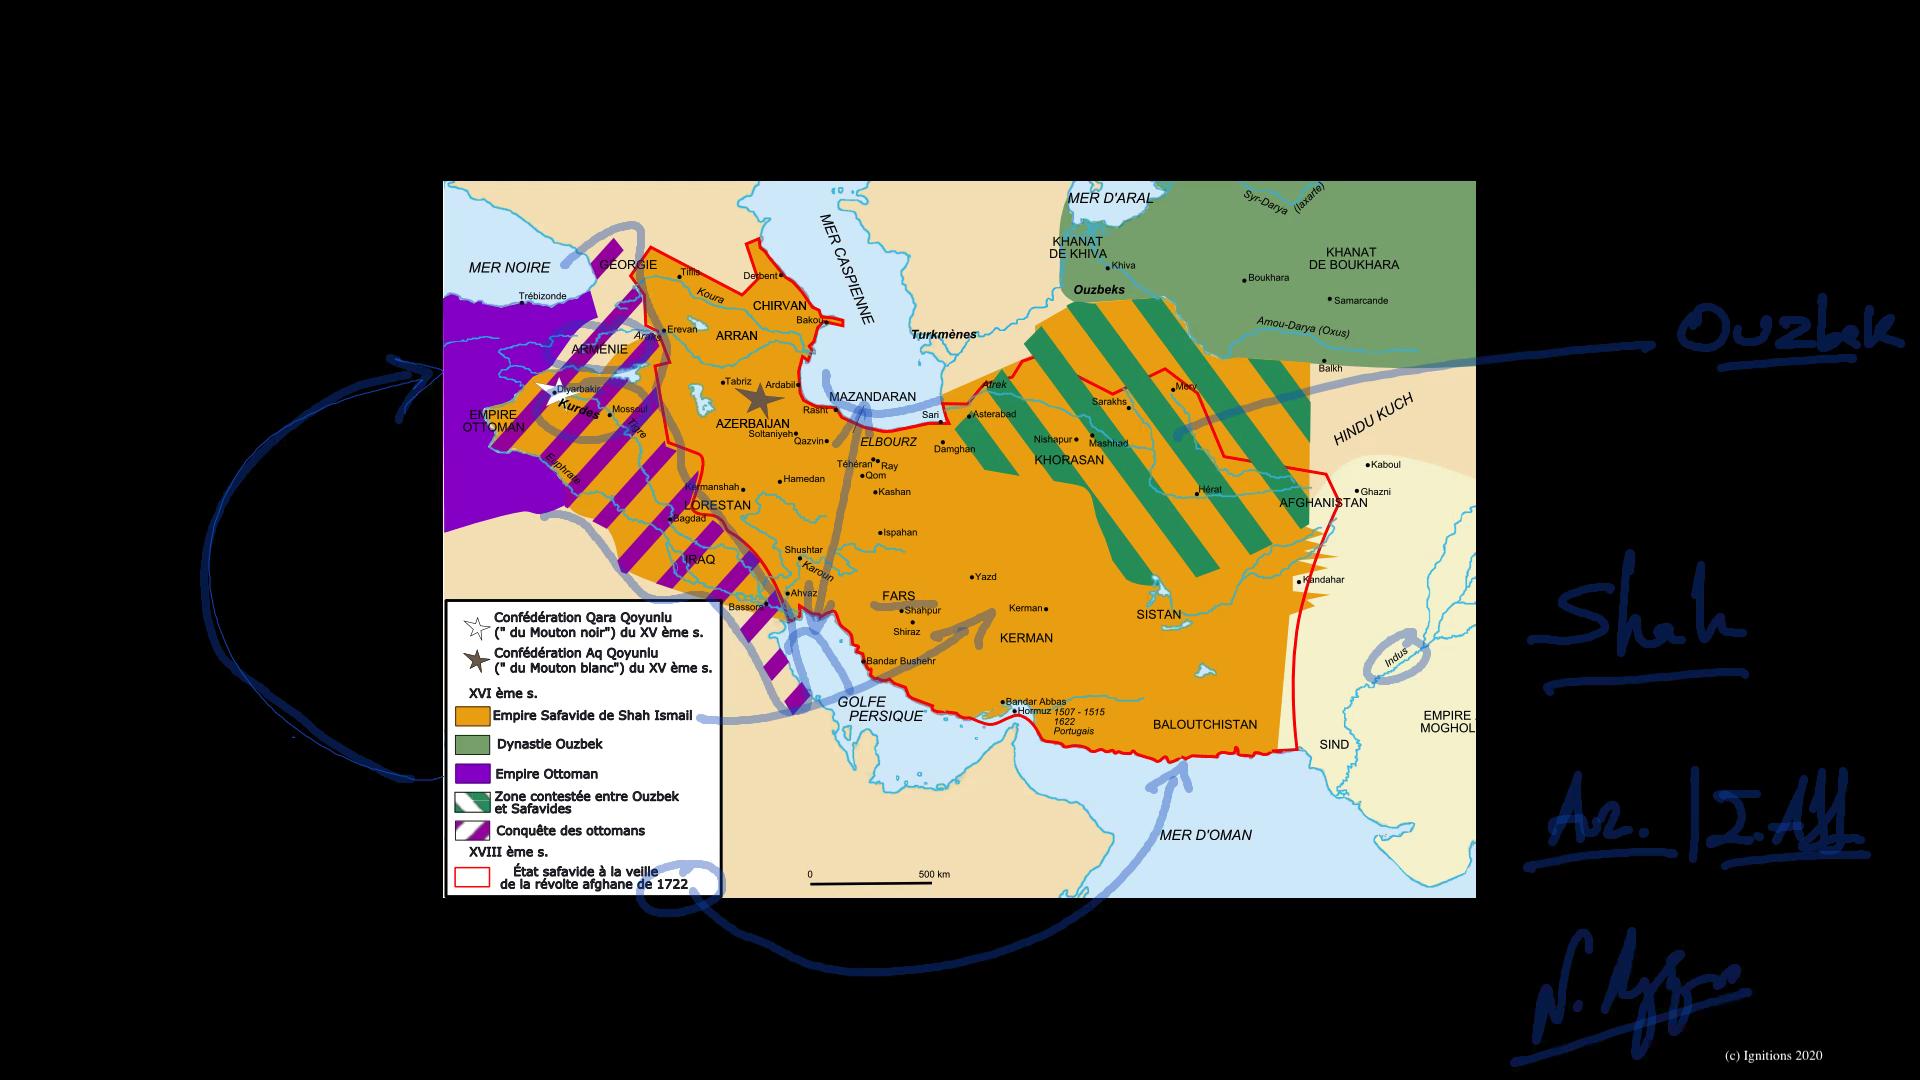 56123 - e-Μάθημα:II-Διαχρονική ιστορία της Περσίας. (Dessin)